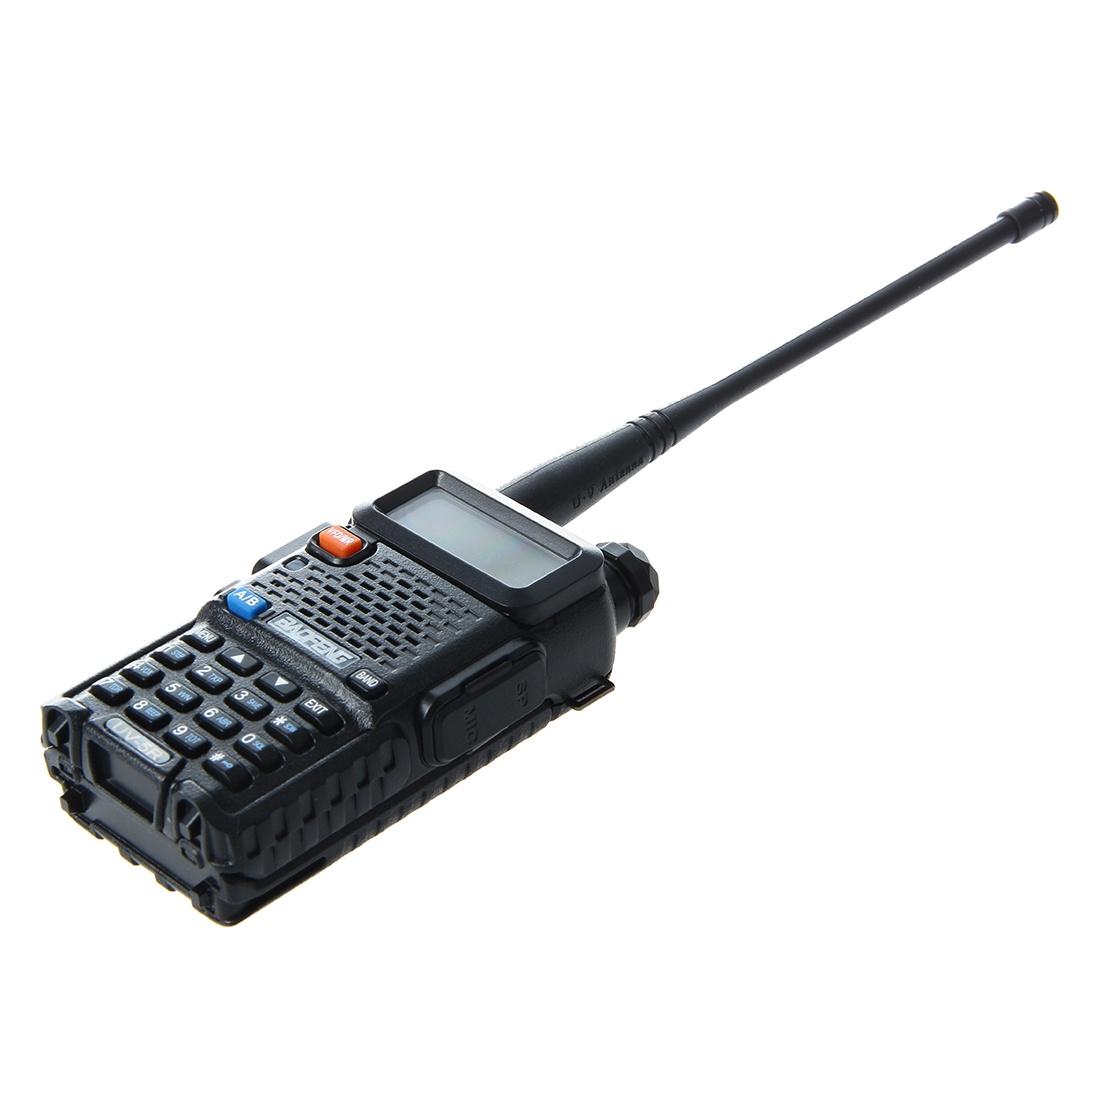 Радиостанция No Name Baofeng UV-5R, черный baofeng bf 888s uhf 400 470 walkie talkie 2